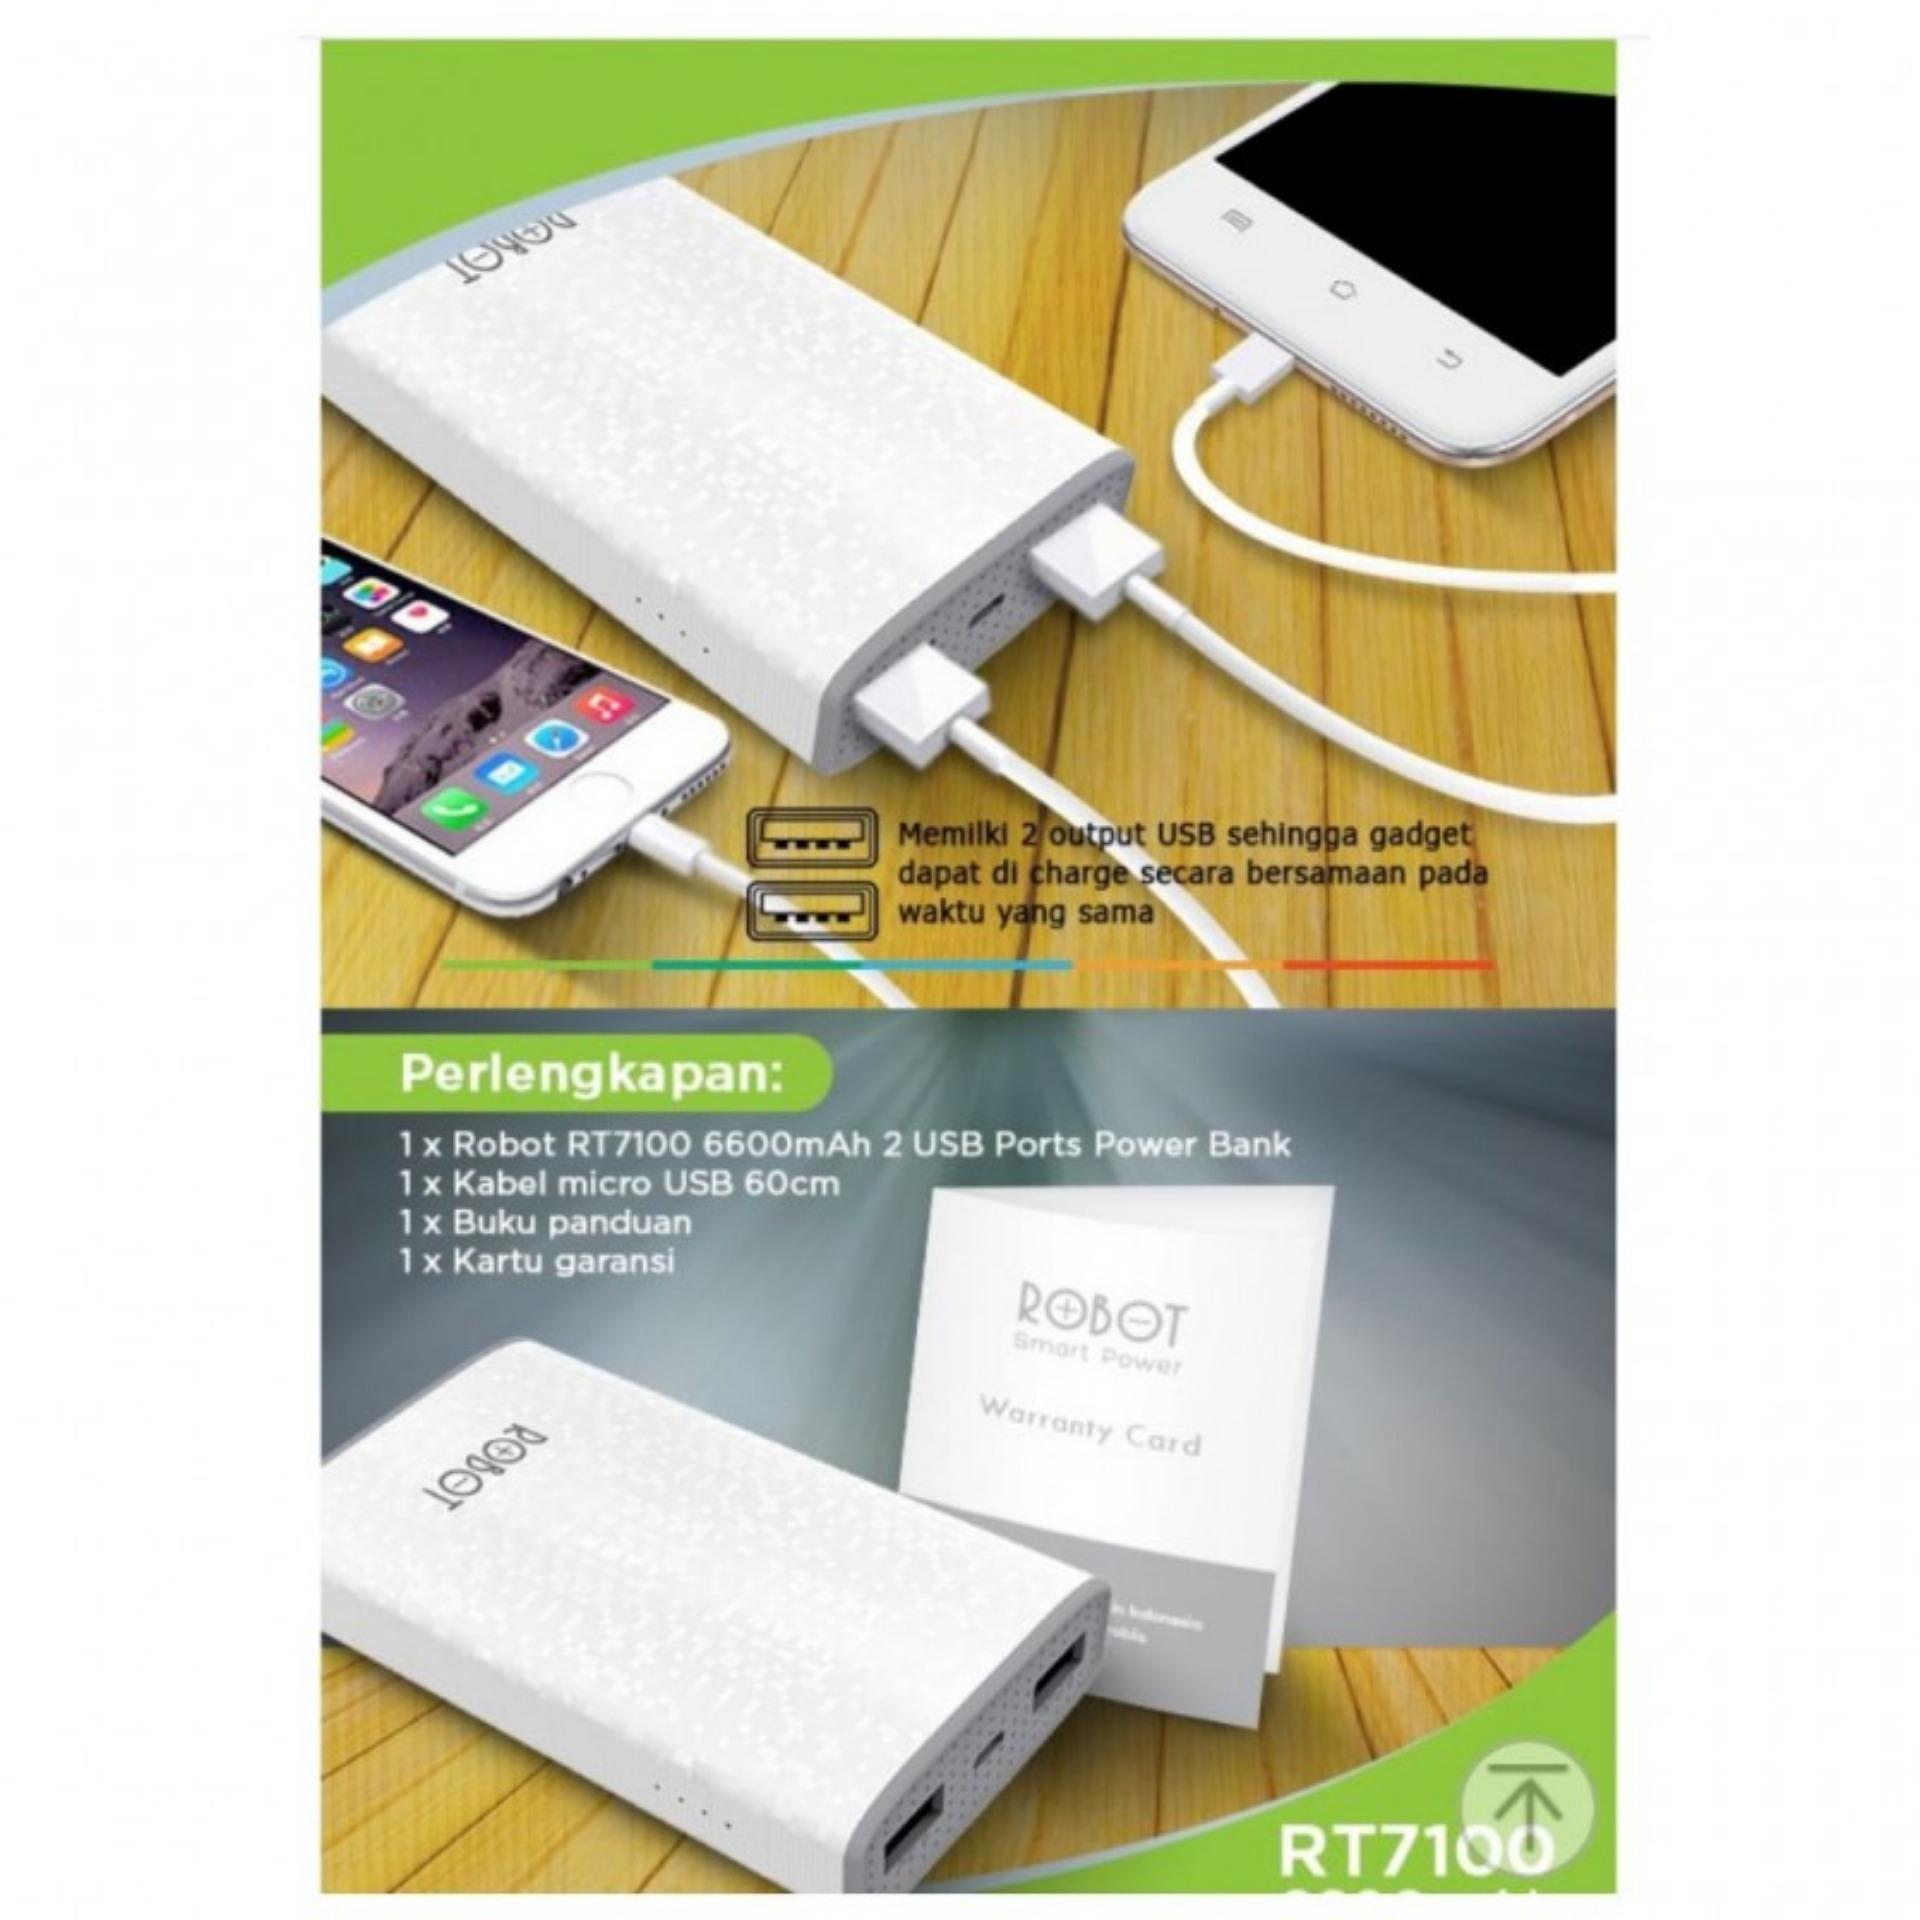 Price Checker Vivan Robot Rt7100 6600mah 2 Usb Ports Power Bank 100 Keunggulan Dan Toshiba Flashdisk